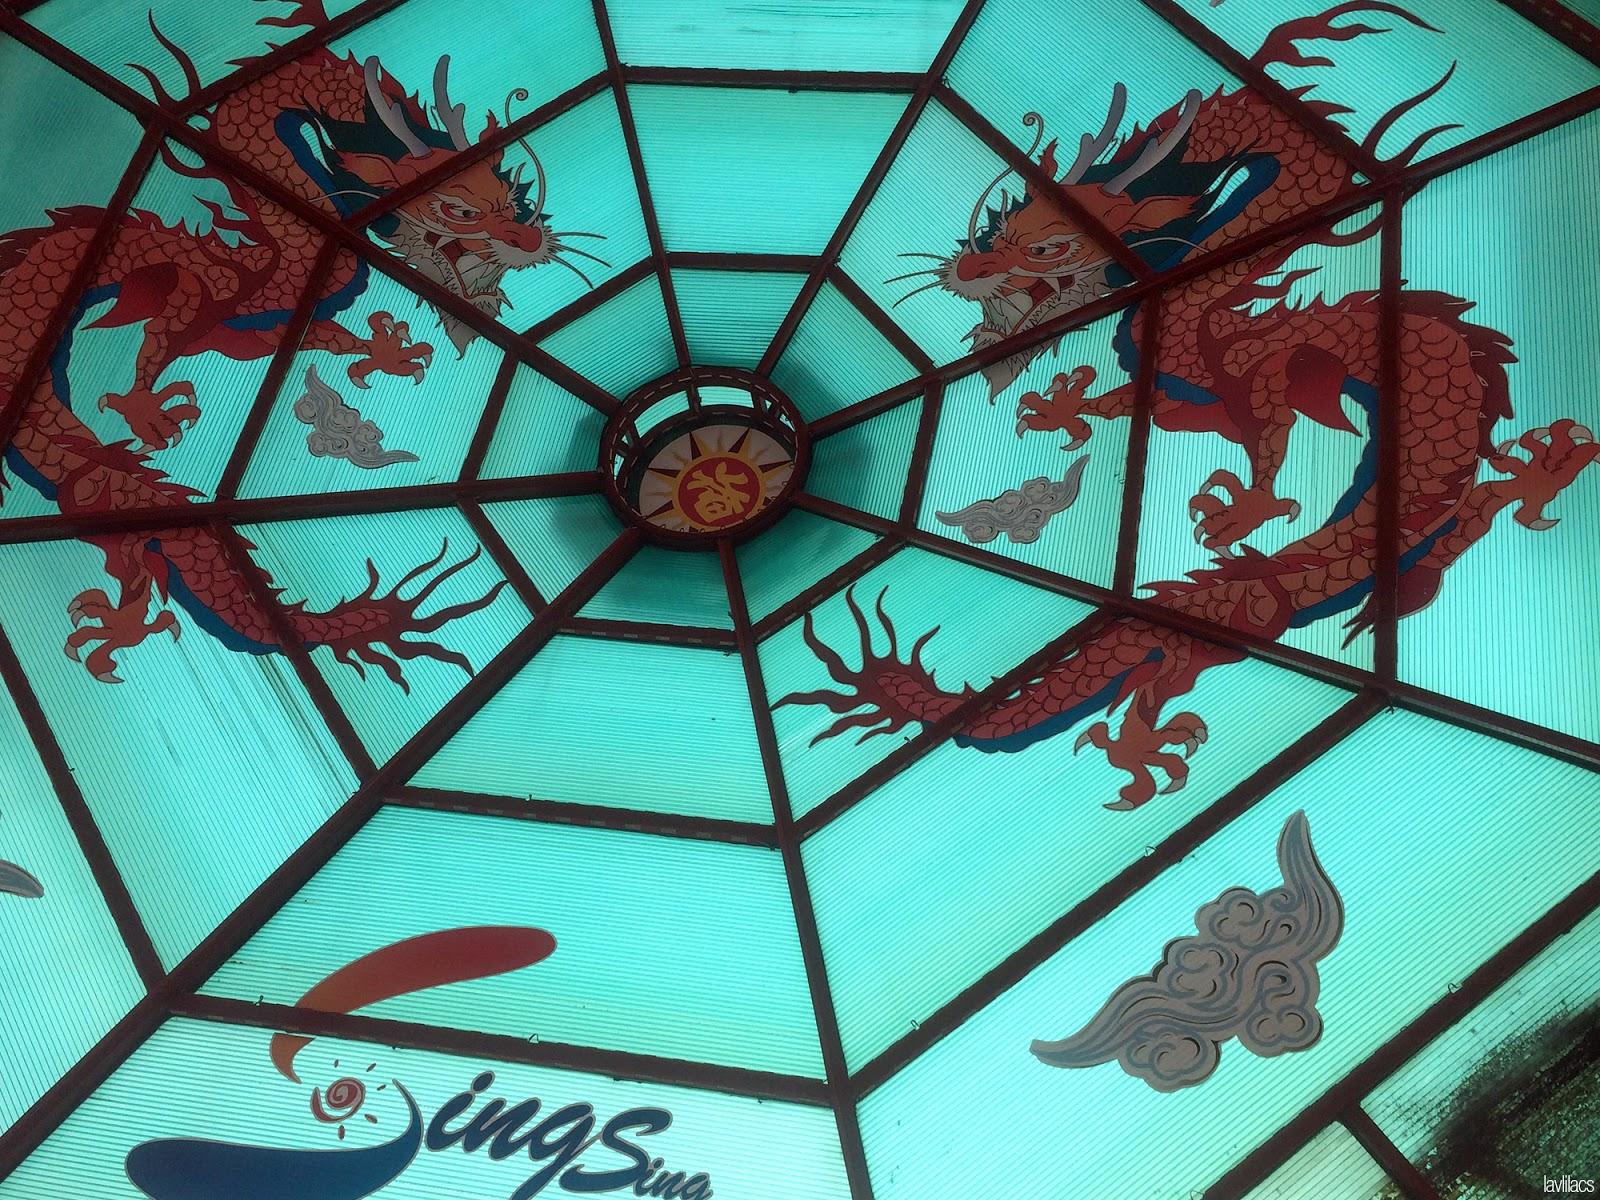 Seoul, Korea - Summer Study Abroad 2014 - Busan Chinatown - Dragons mural